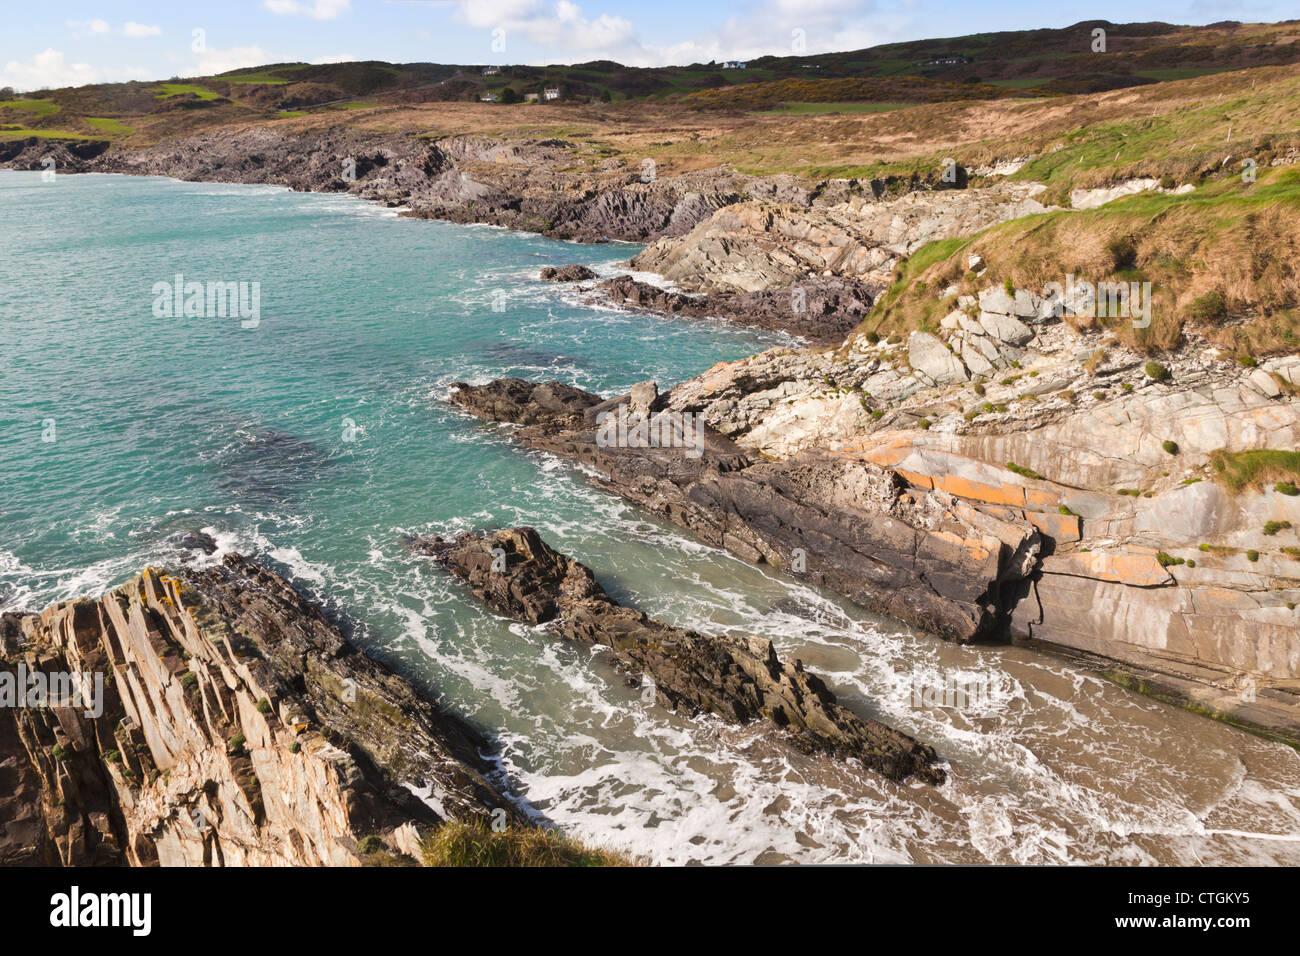 Sandy Cove, West Cork, Ireland. - Stock Image